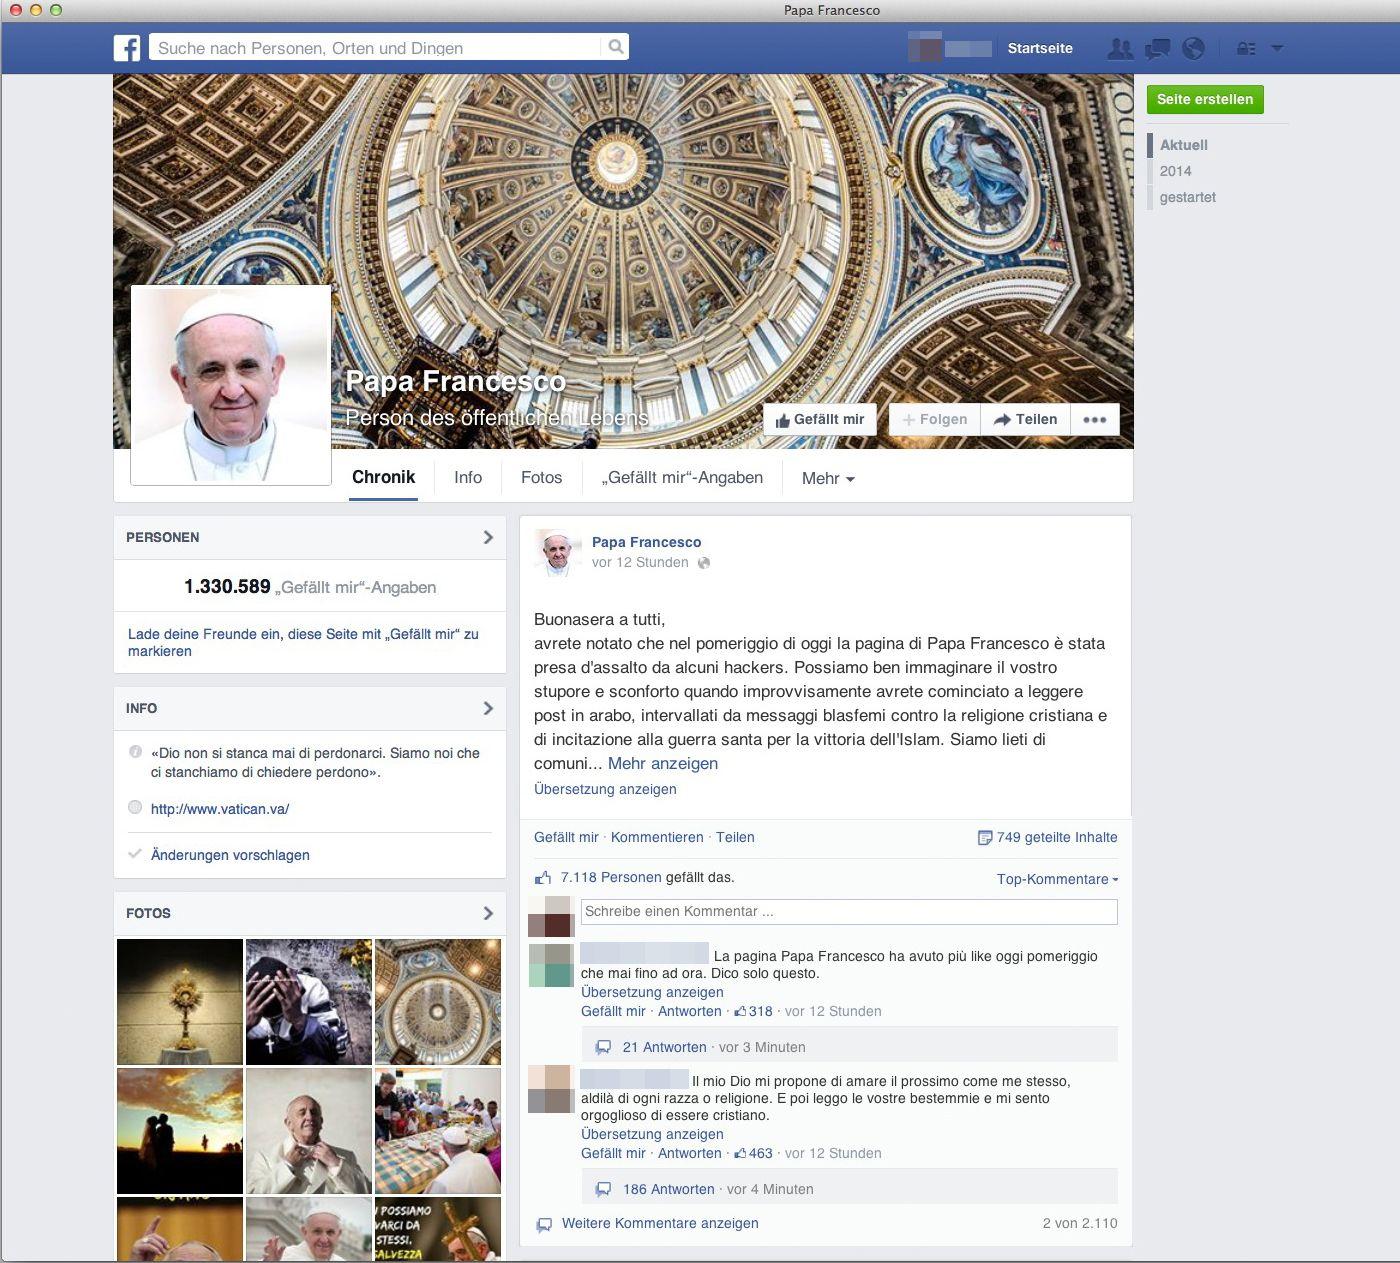 EINMALIGE VERWENDUNG SCREENSHOT/ Papst/ Franziskus/ Facebook